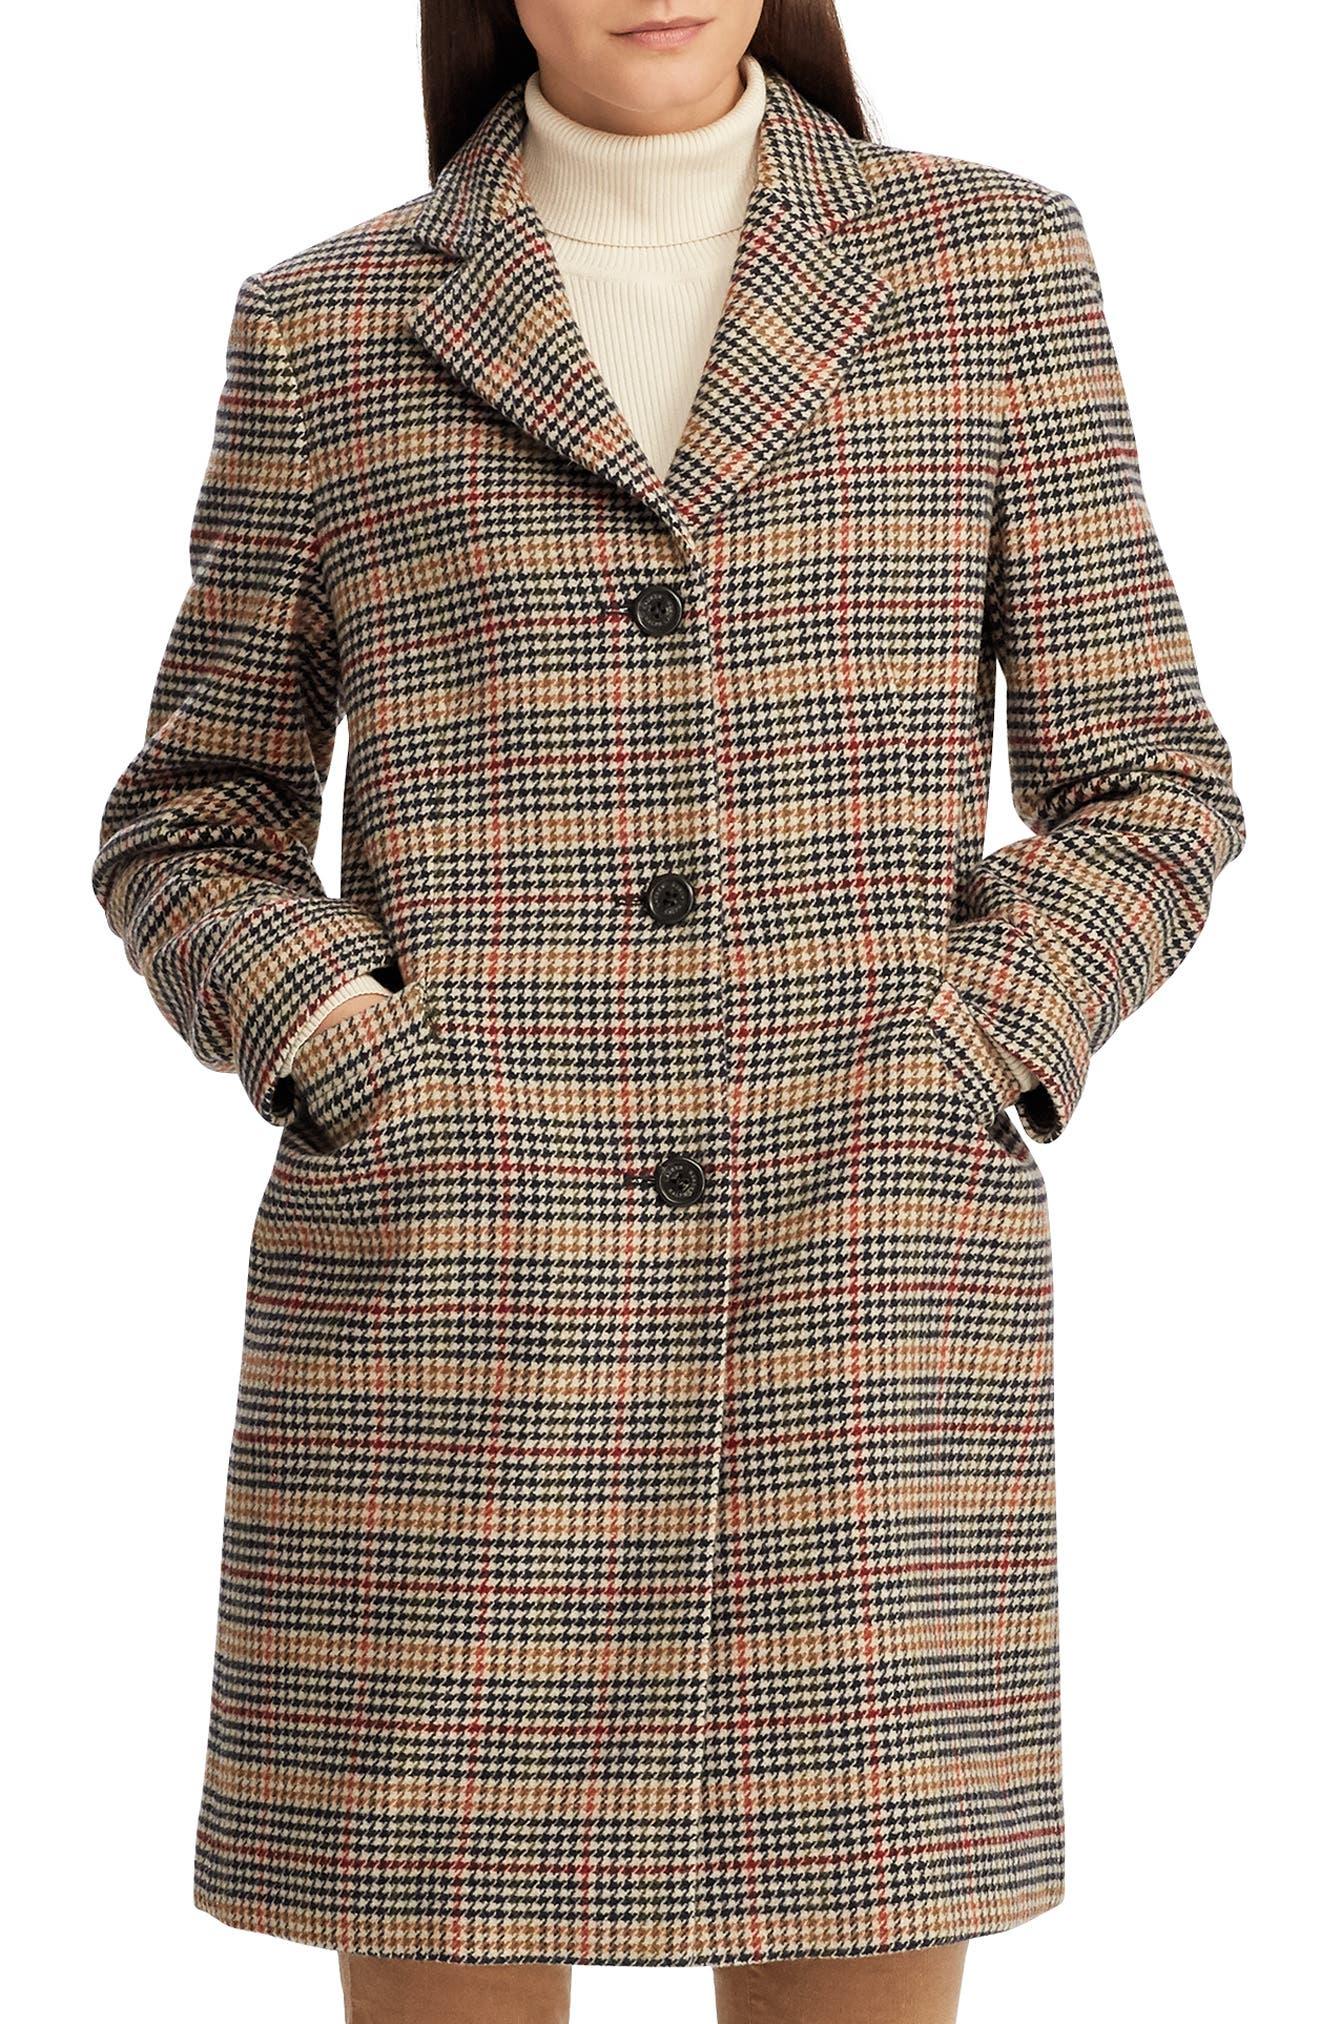 70s Jackets & Hippie Vests, Ponchos Womens Lauren Ralph Lauren Wool Blend Reefer Coat $147.40 AT vintagedancer.com